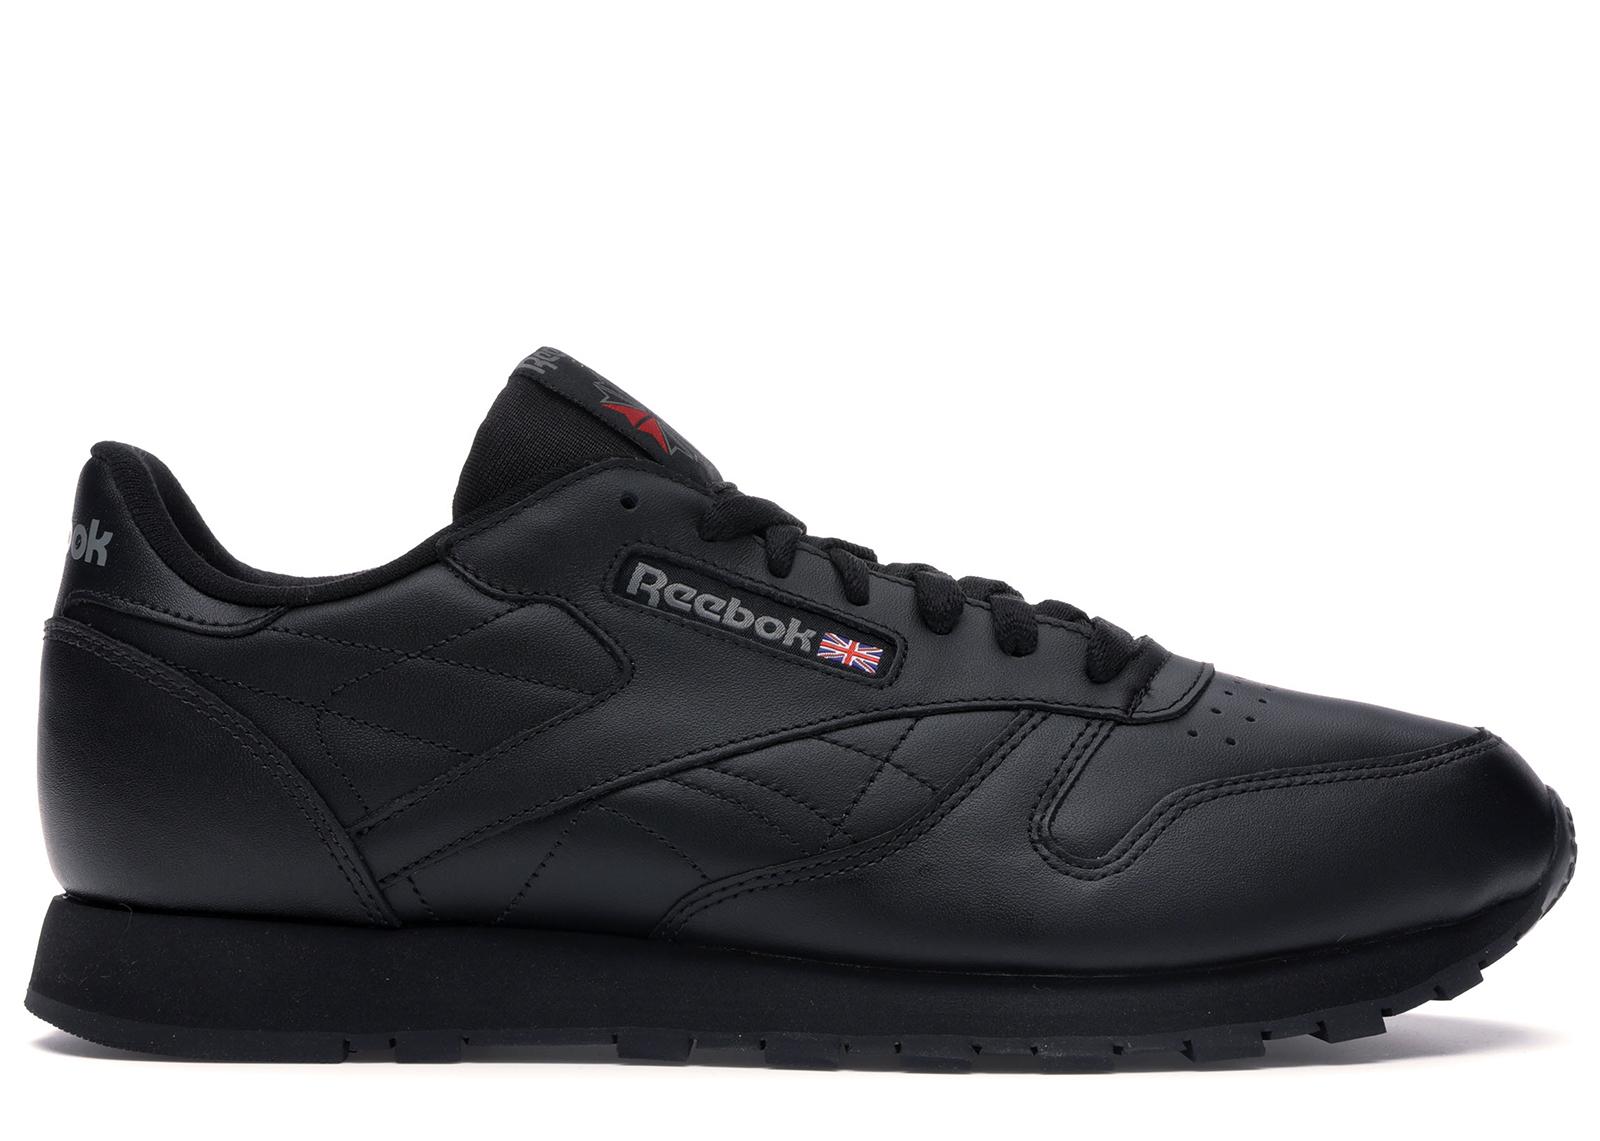 Reebok Classic Leather Black - 116